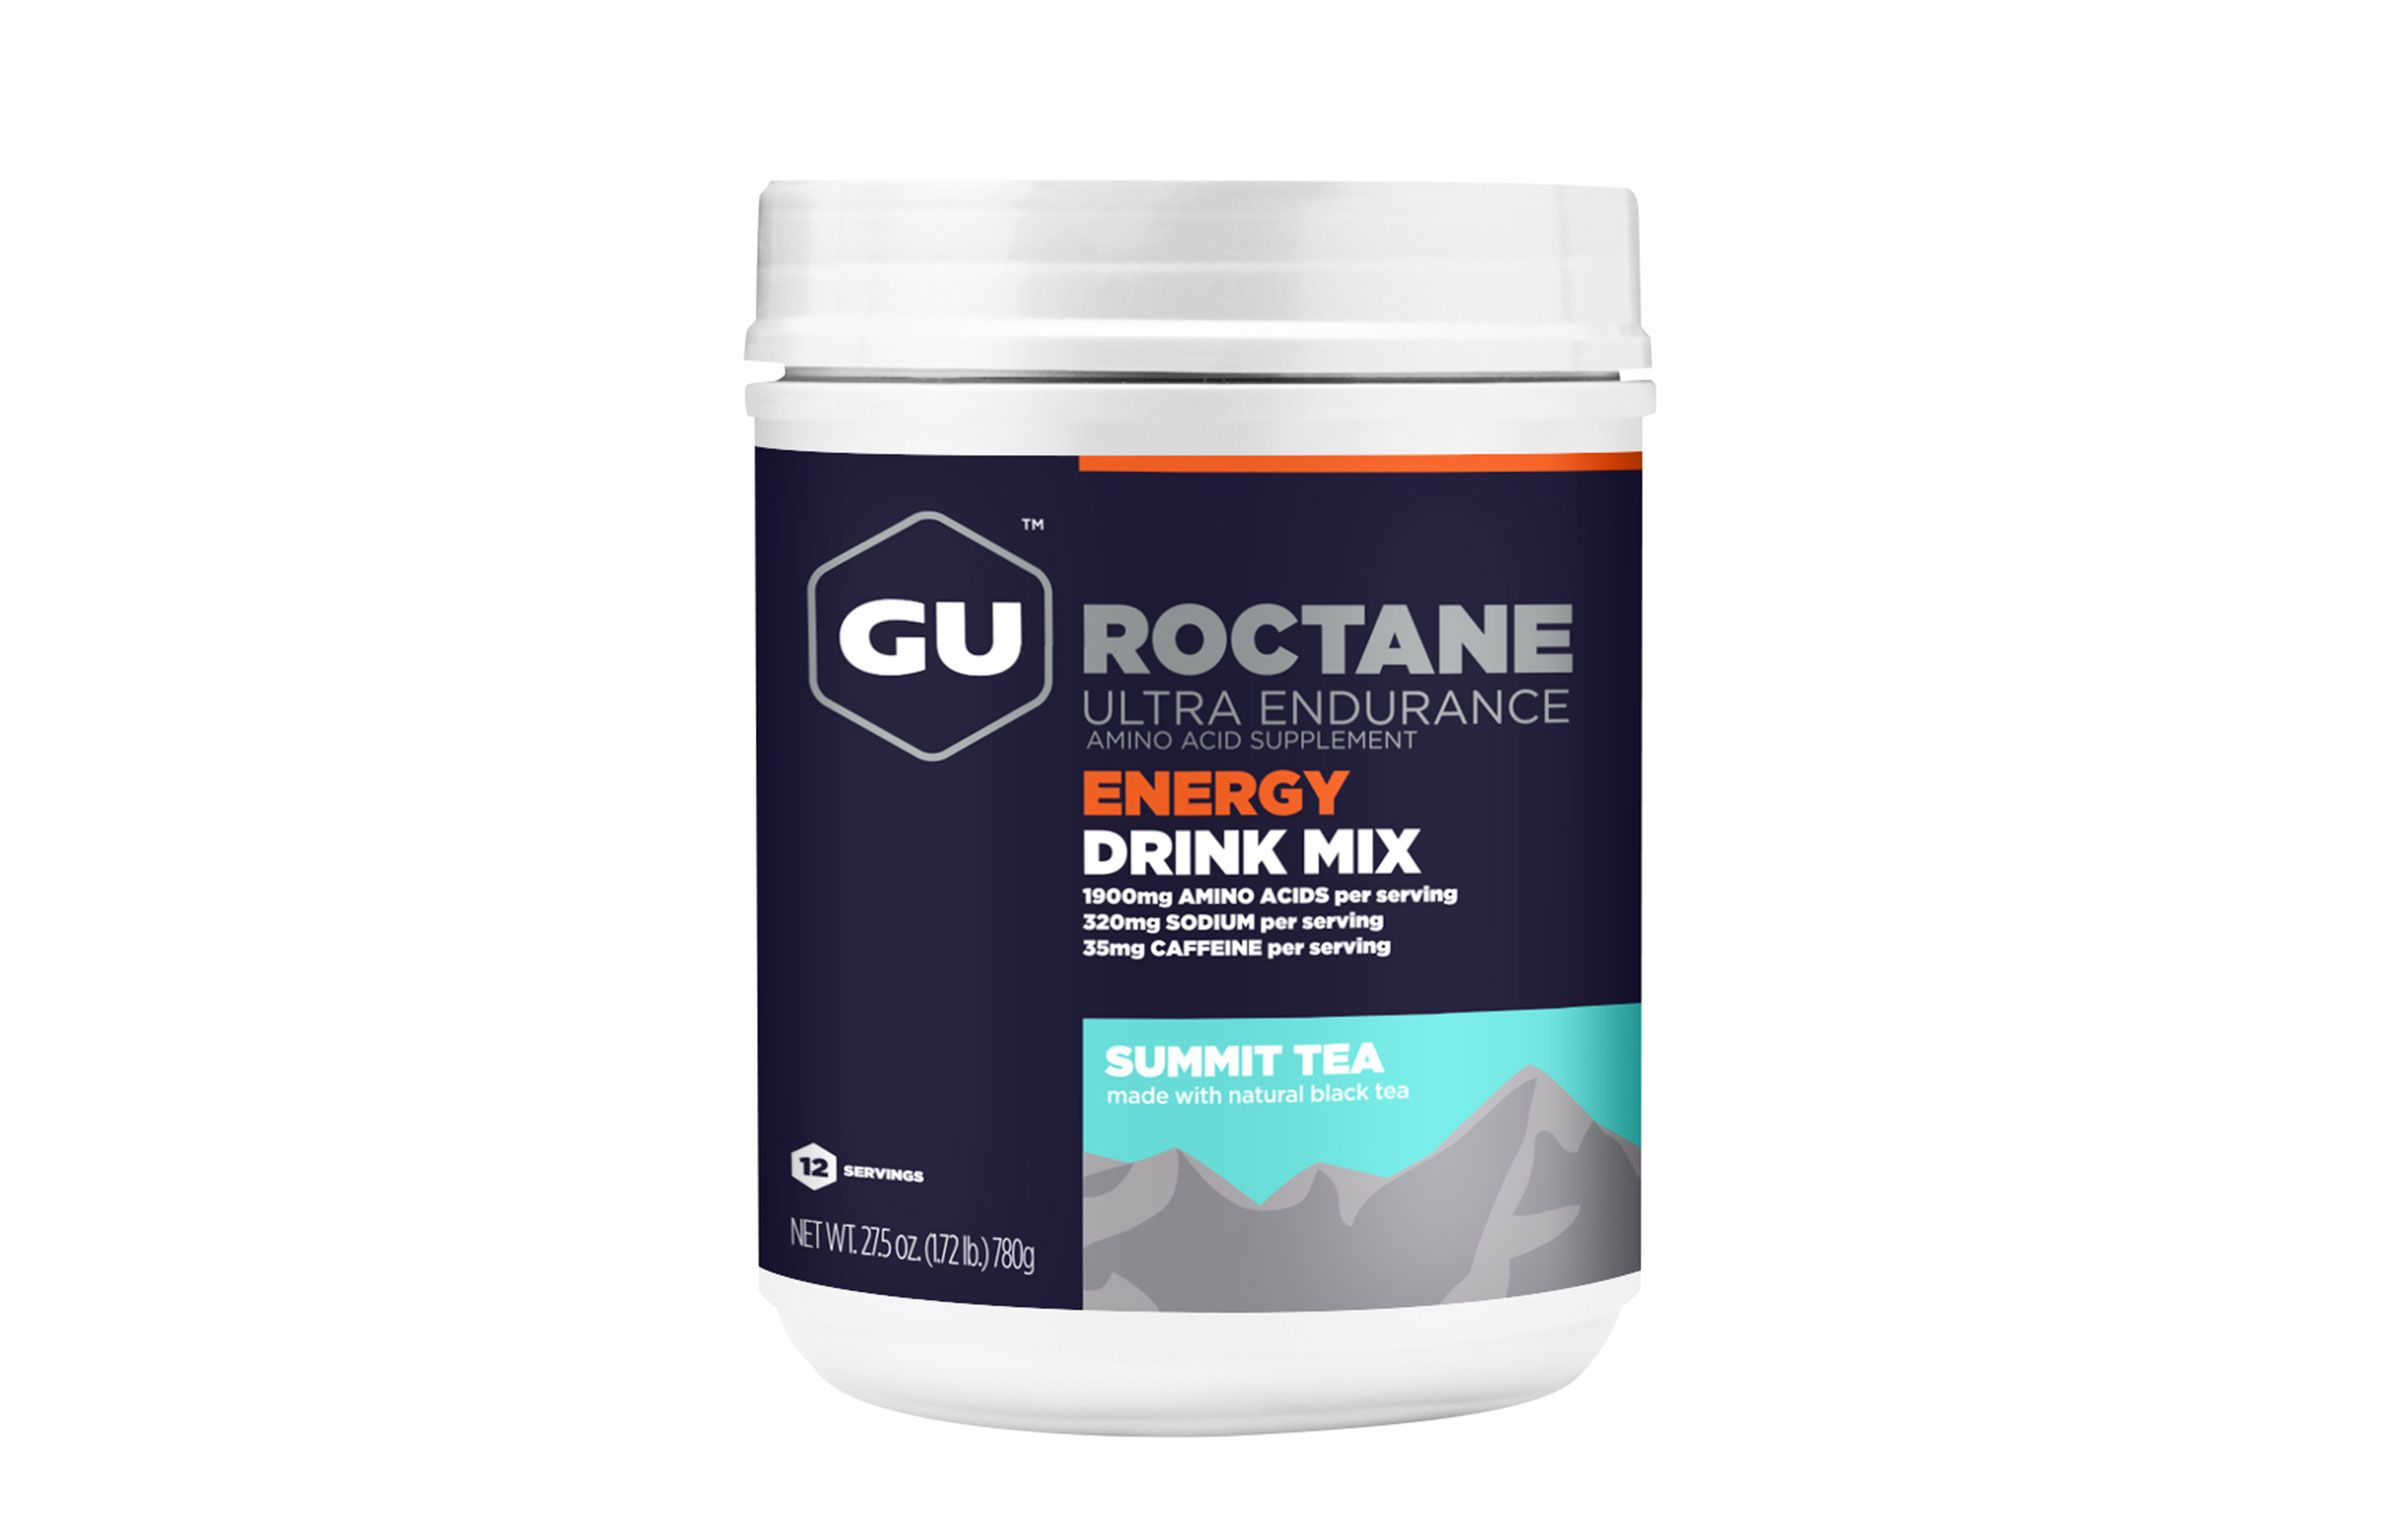 GU Roctane Energy Drink Mix